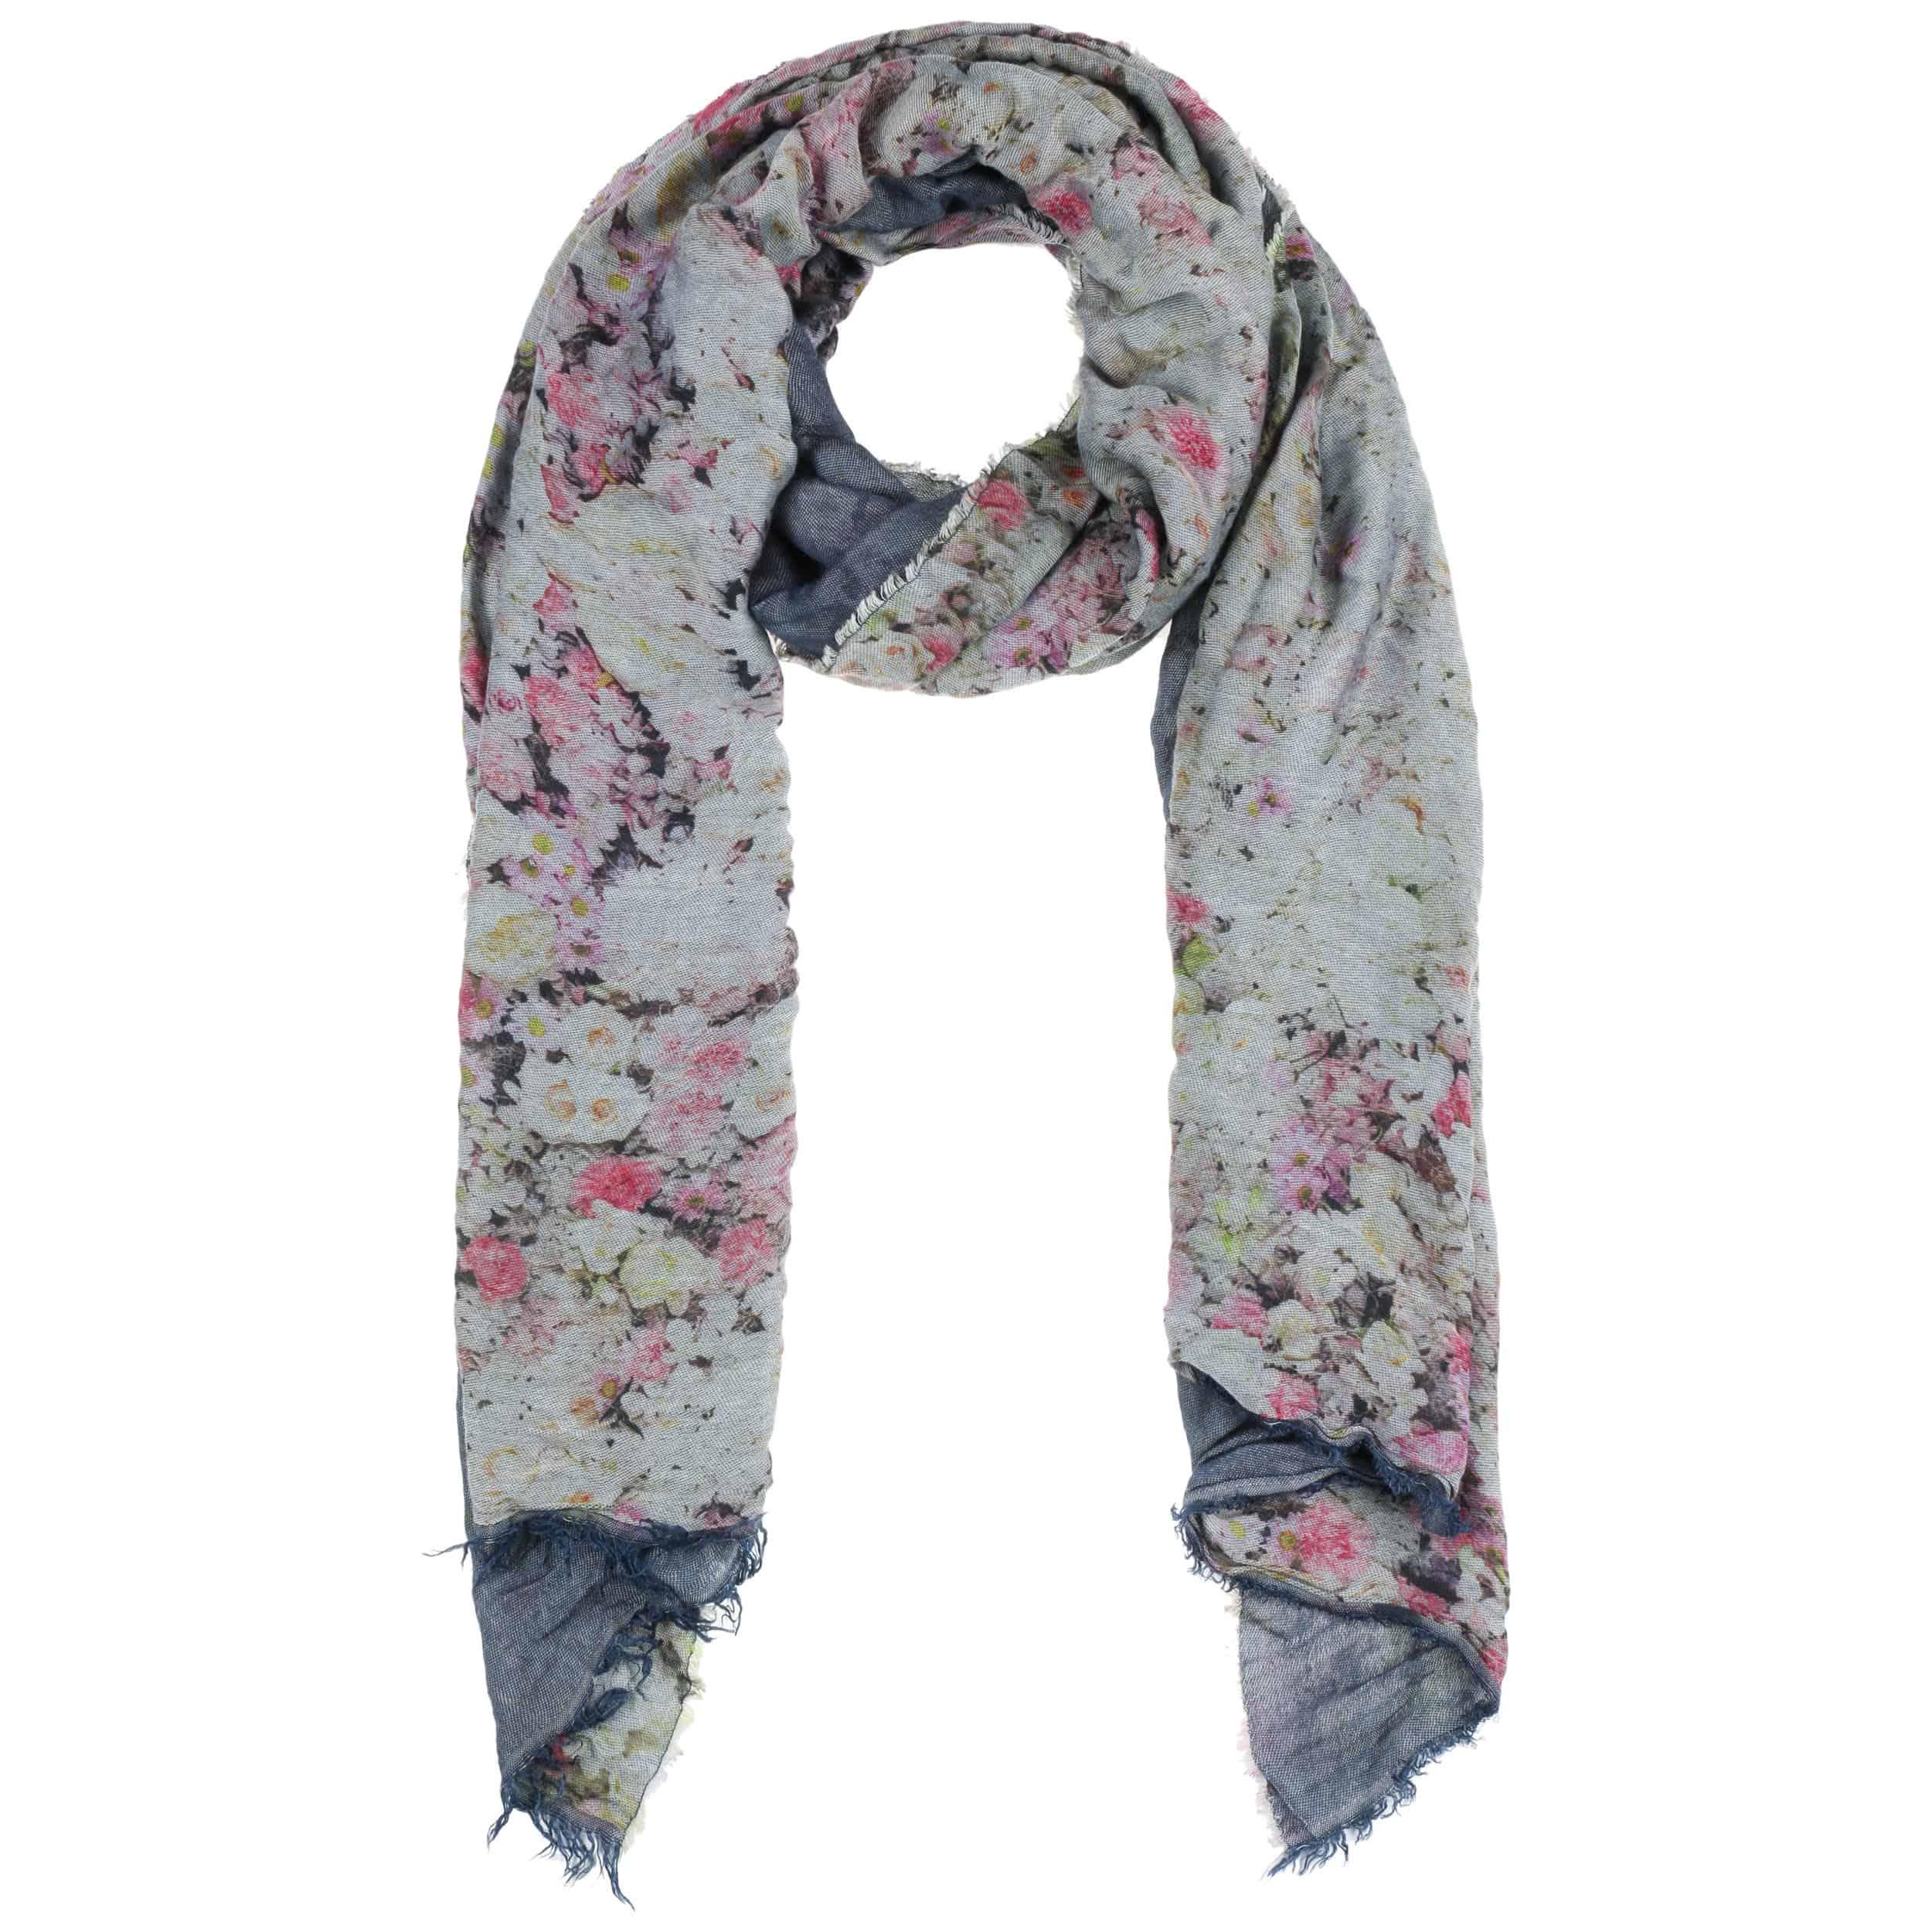 nuovi stili e1712 6575c Flowerheaven Foulard Donna by Passigatti